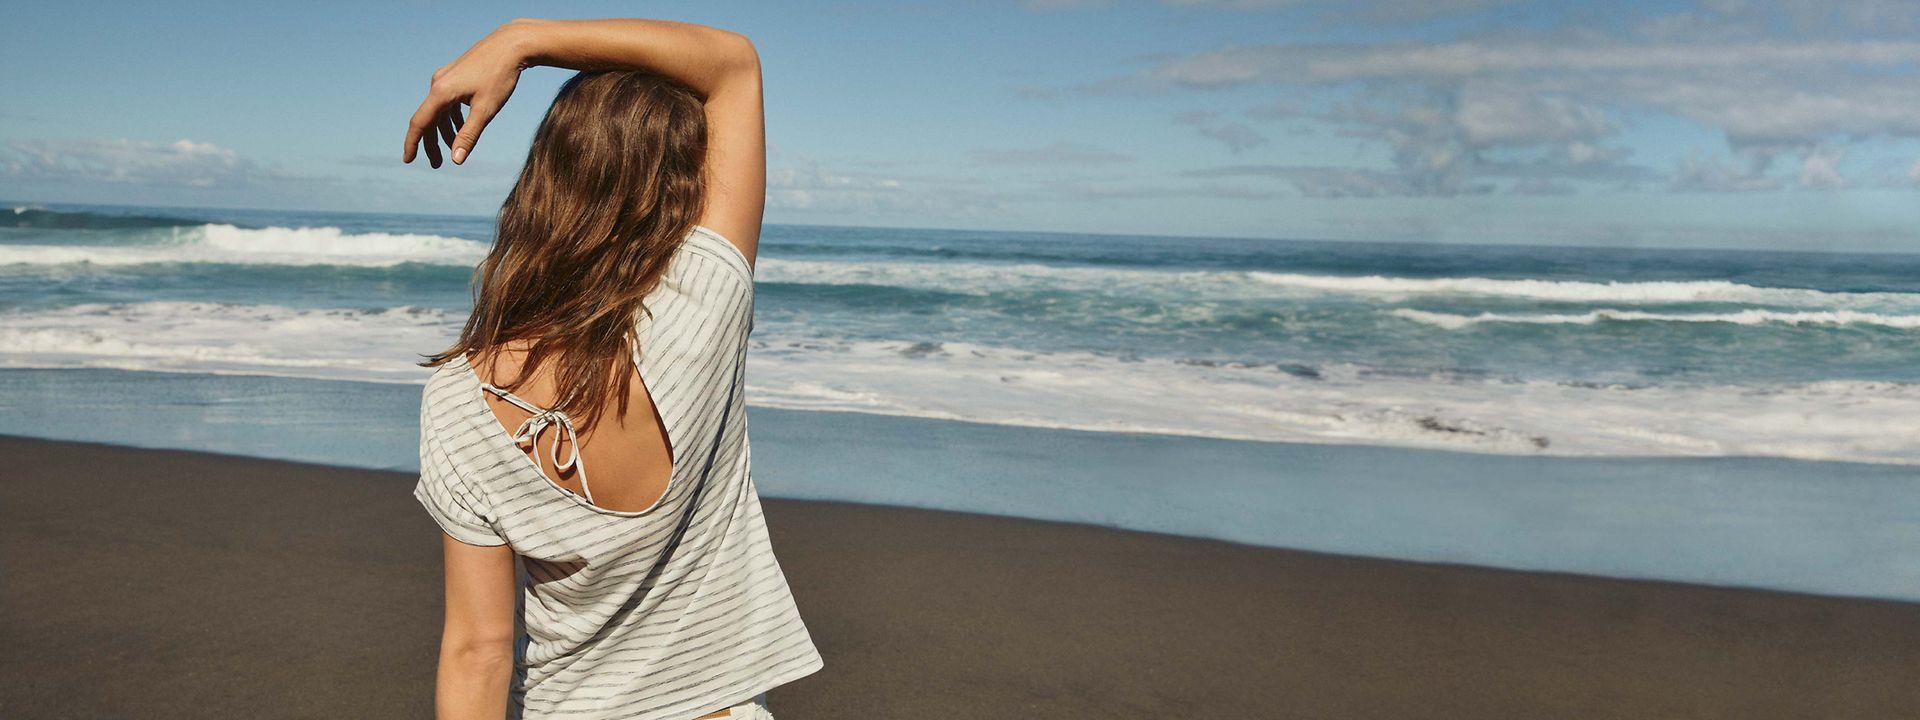 242021 - women - startpage - main banner - summer - T-Shirt Time -IMG